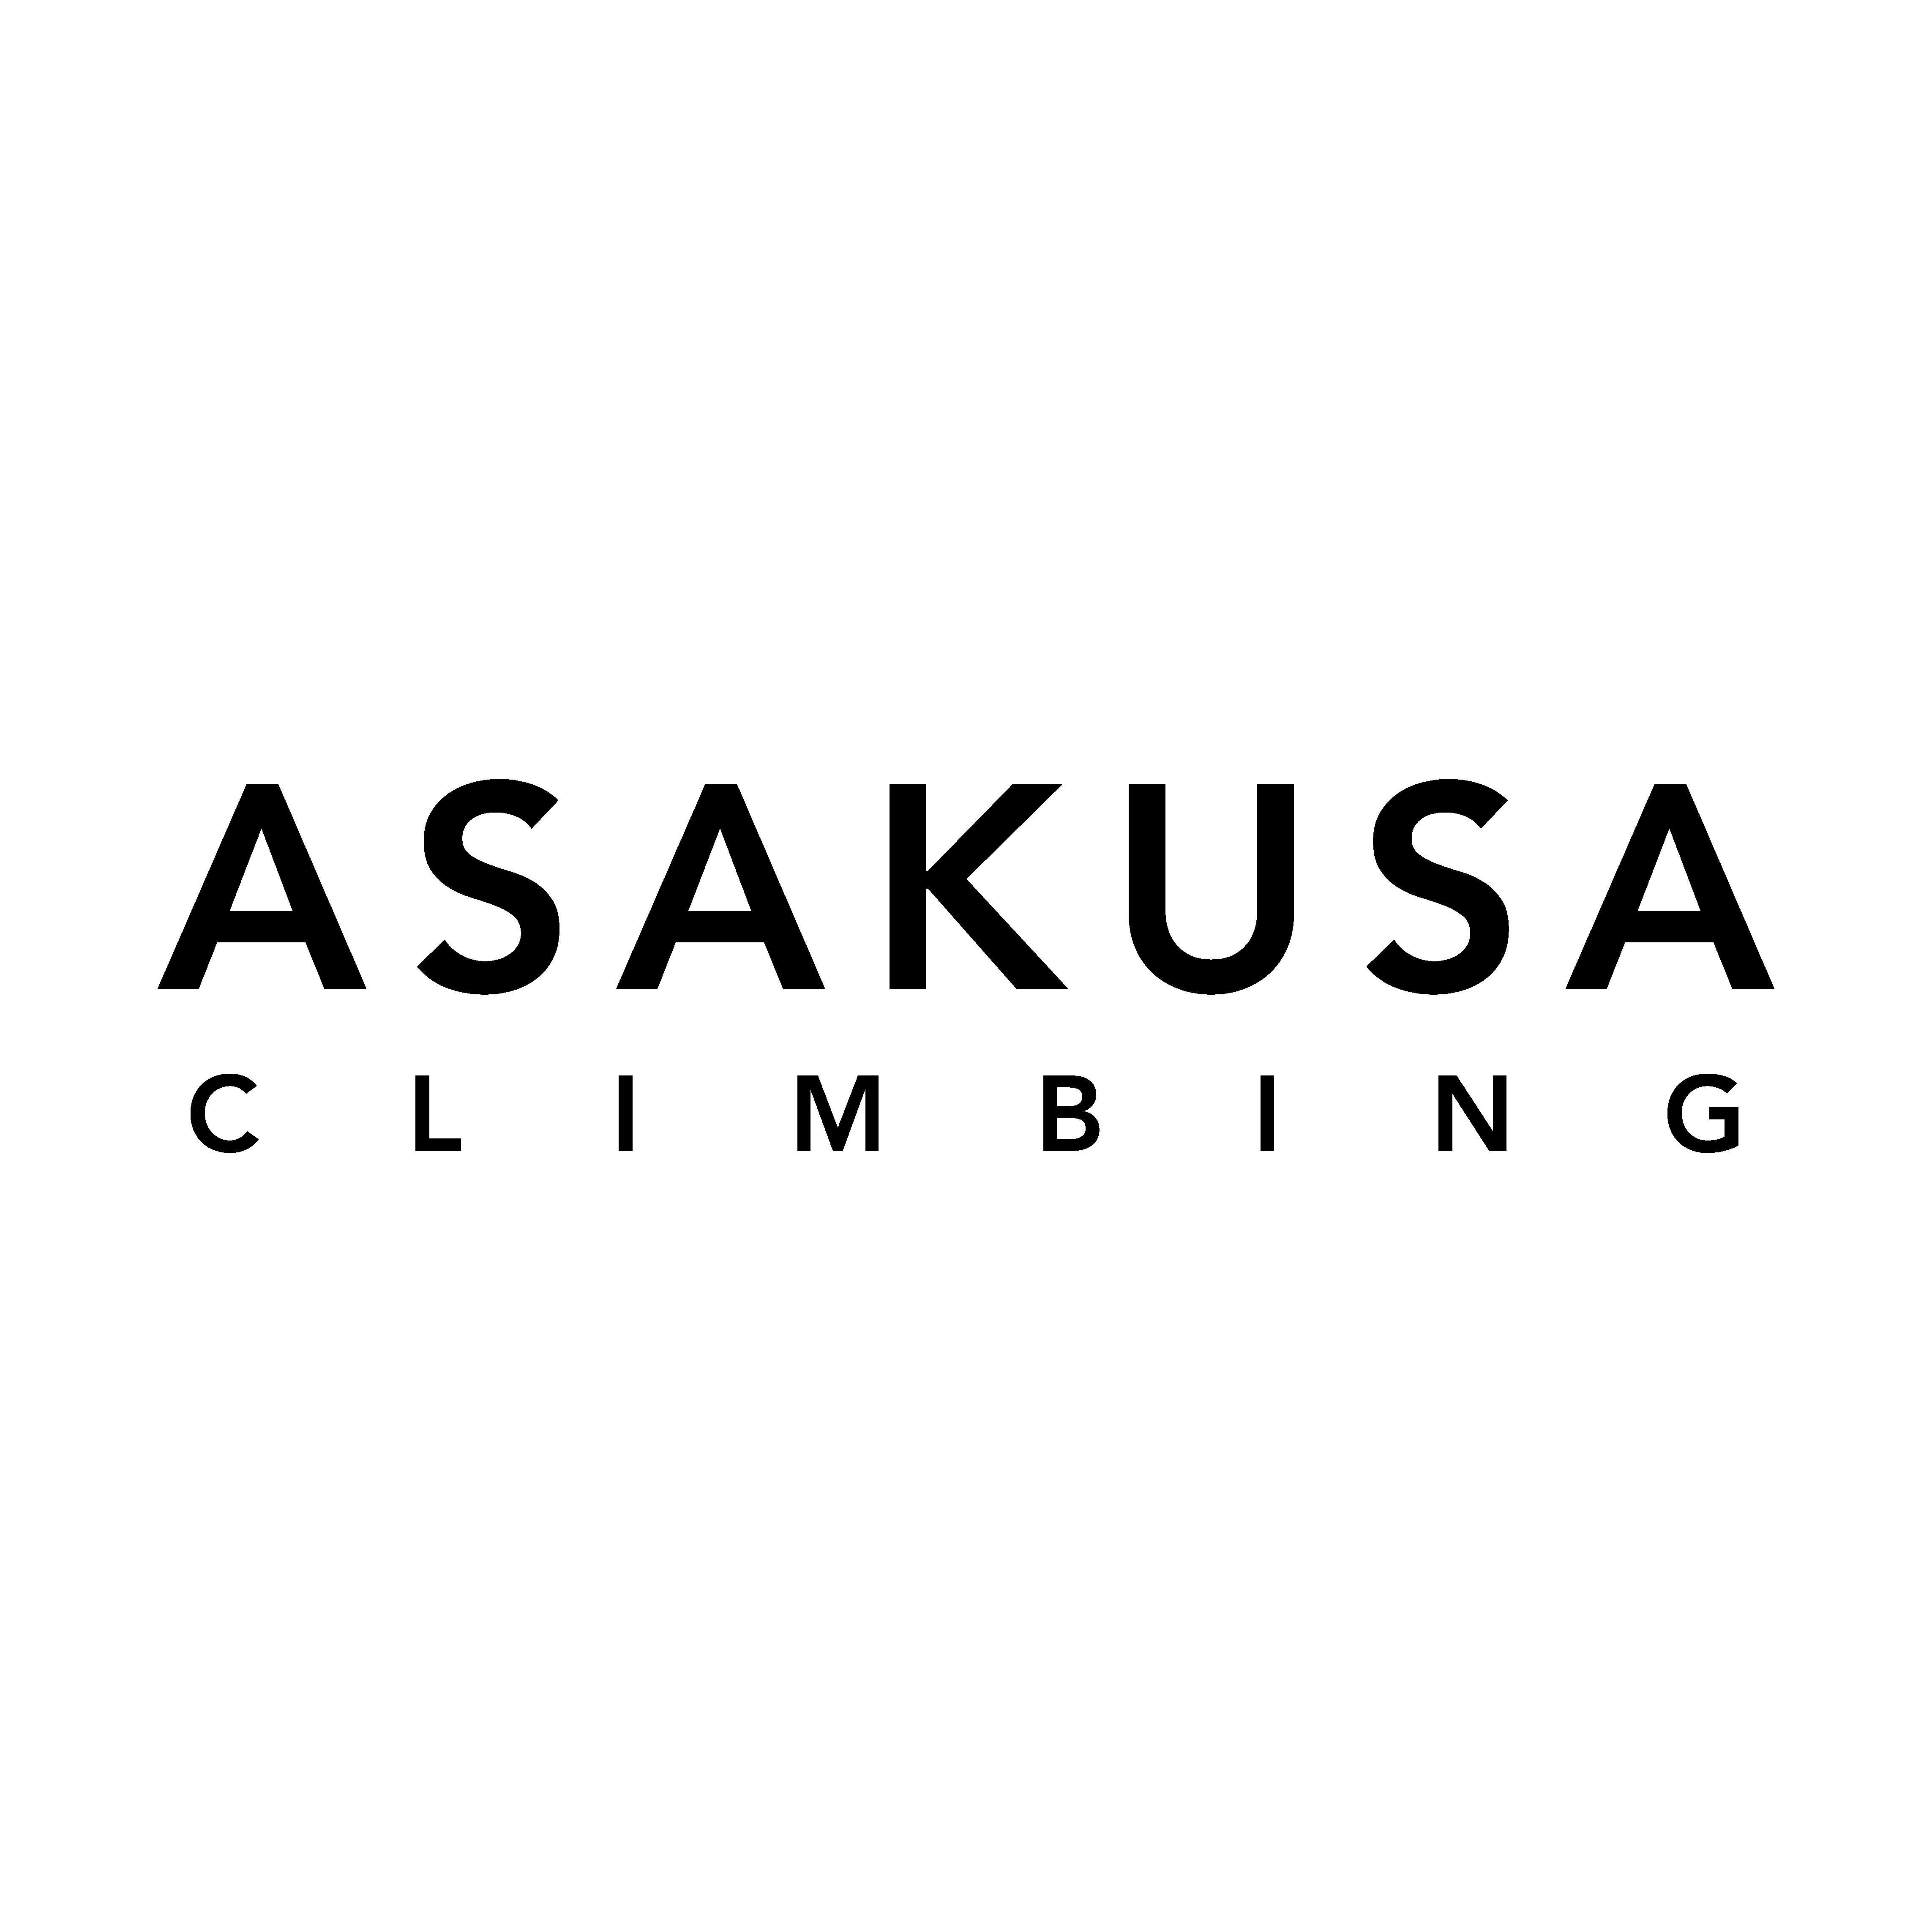 asakusaclimbing-01